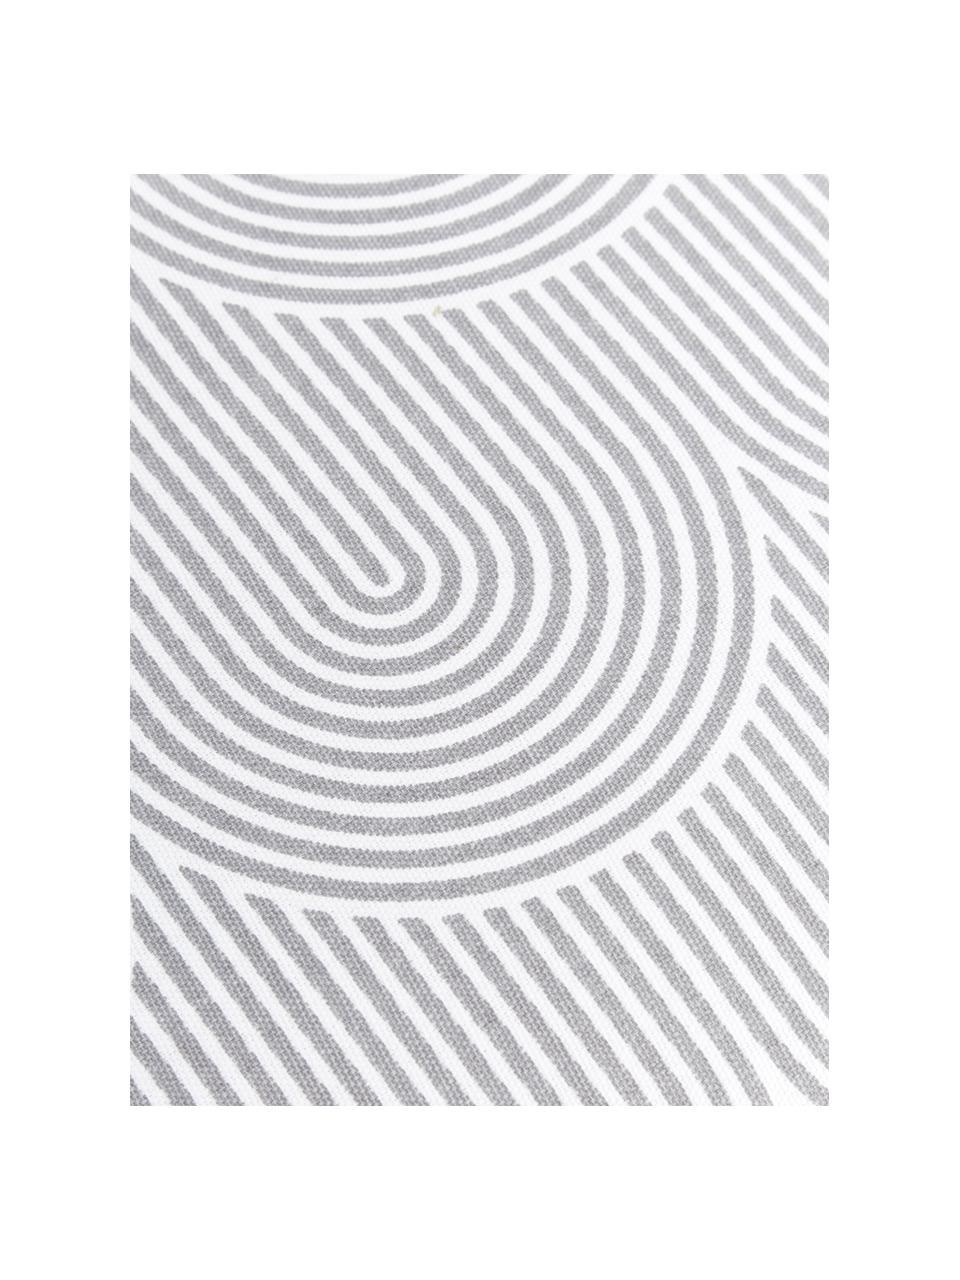 Hohes Sitzkissen Arc in Hellgrau/Weiß, Bezug: 100% Baumwolle, Grau, 40 x 40 cm